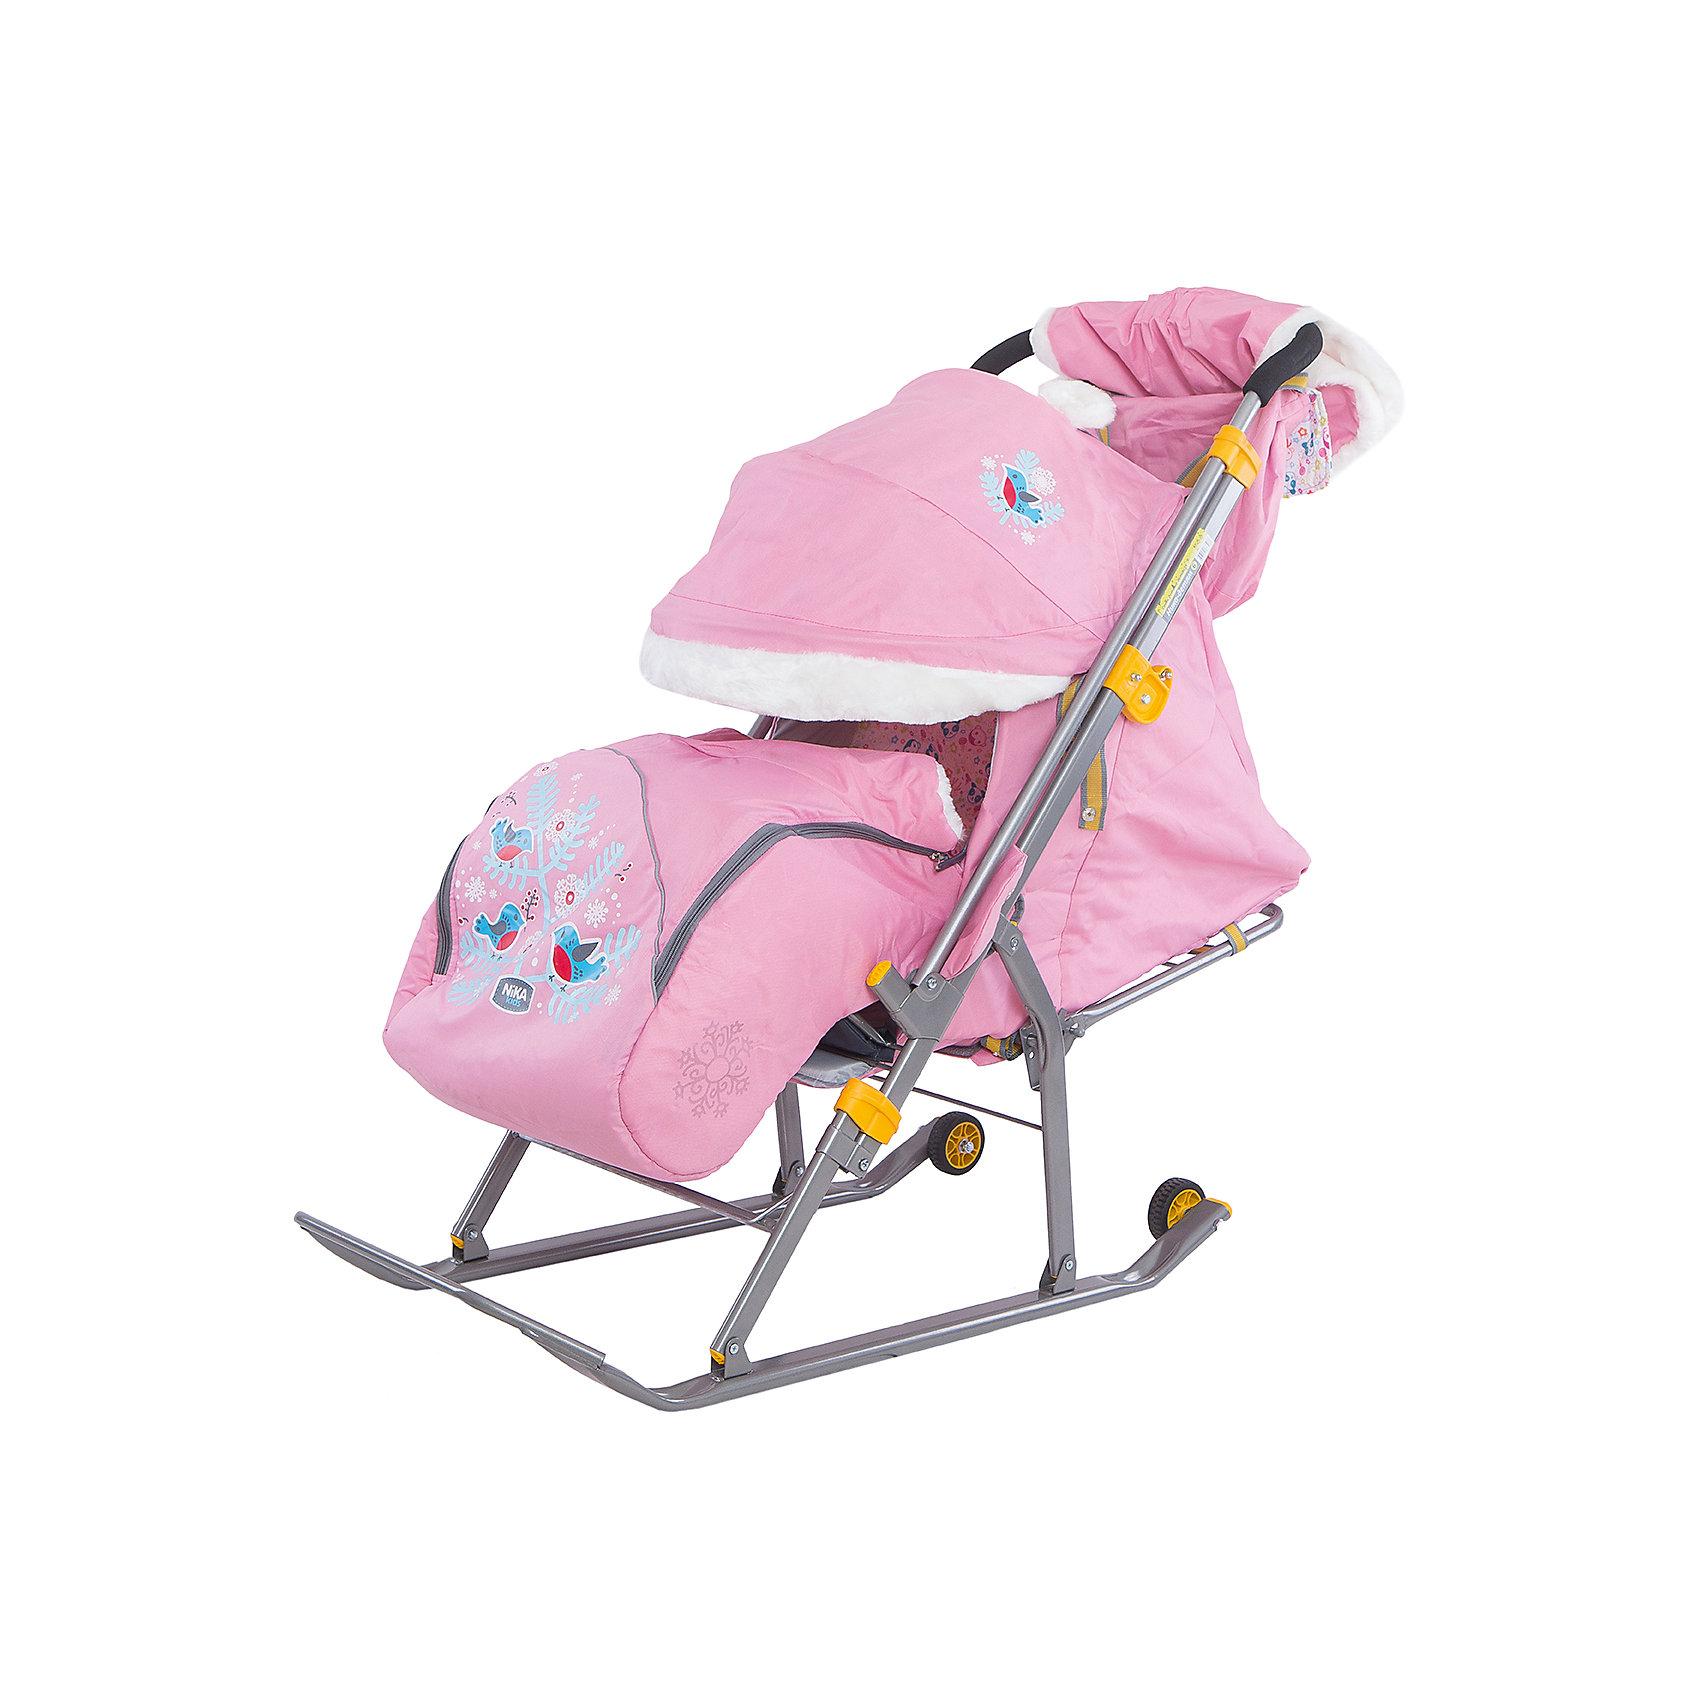 Ника Санки-коляска Ника детям 6, Снегири на ветке, ника санки коляска детские лилия